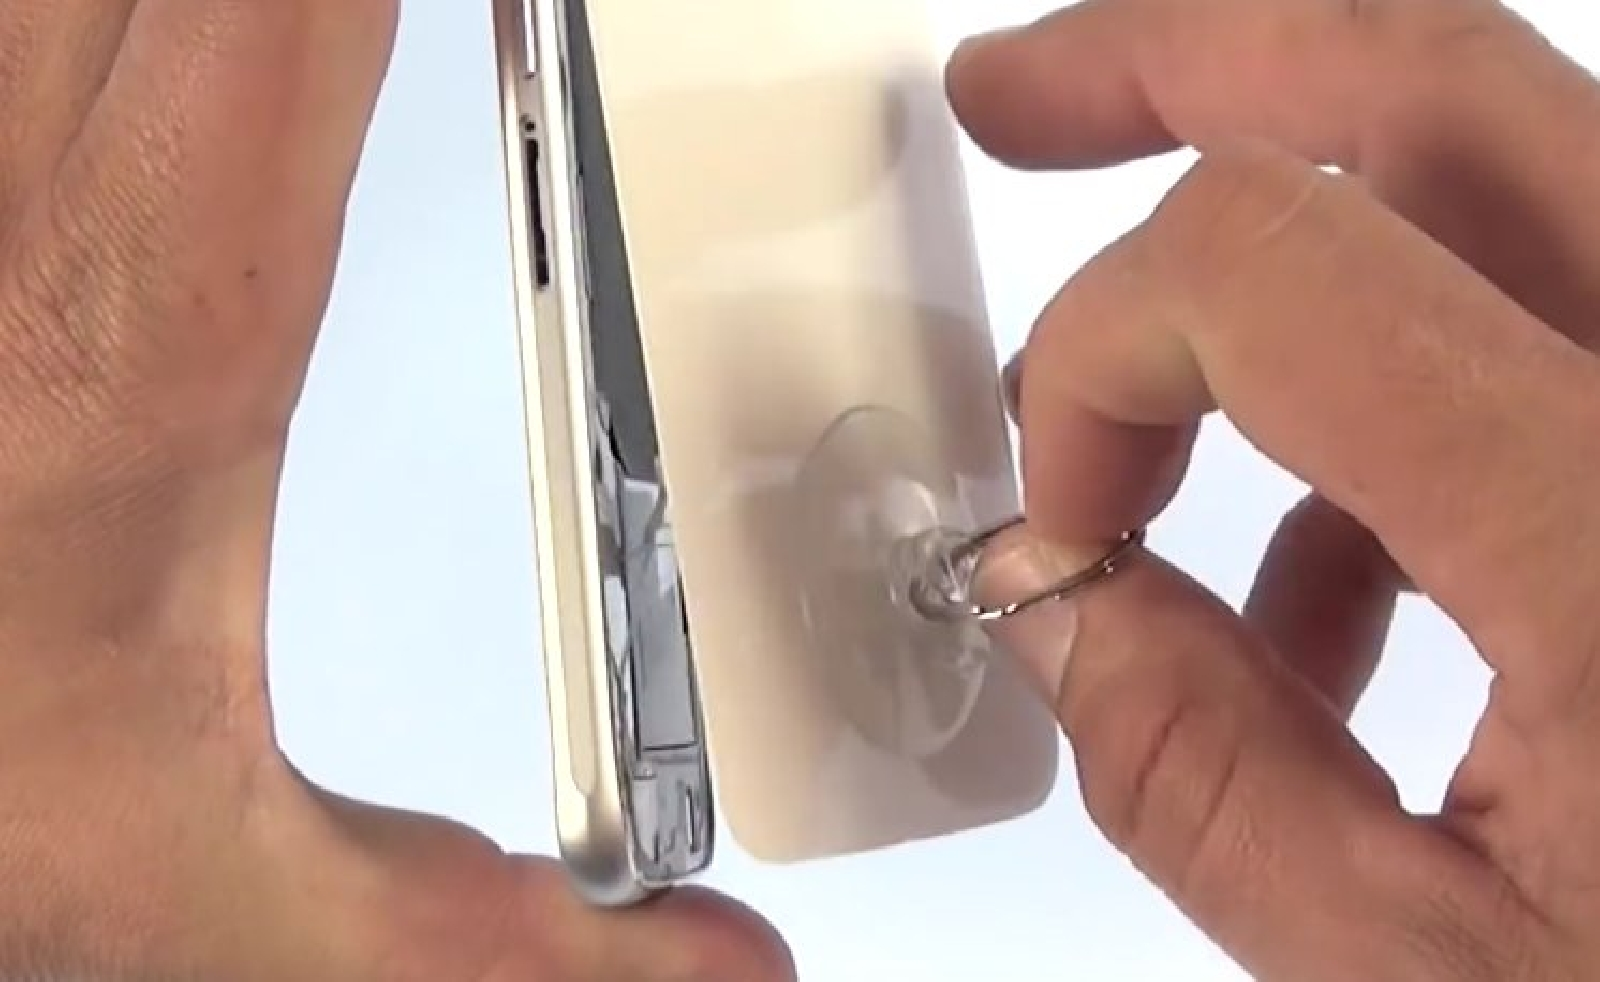 Etape 3: Retirer la vitre et nettoyer le châssis